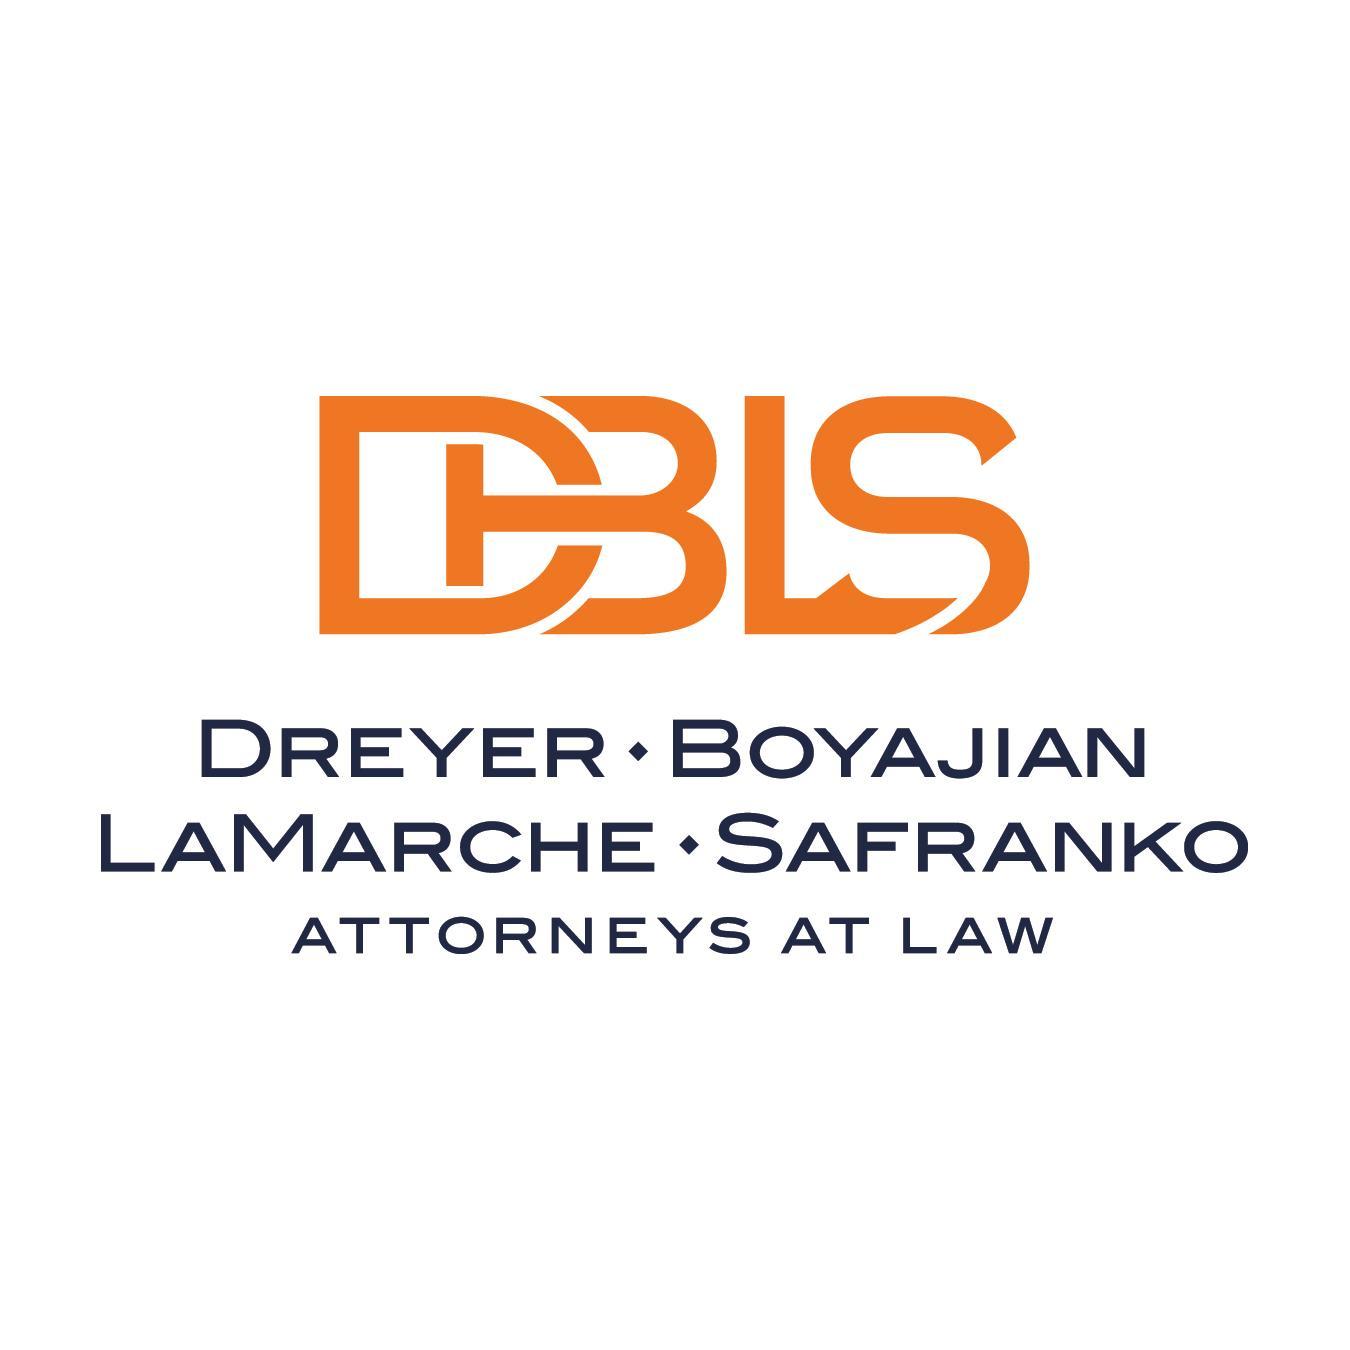 Dreyer Boyajian LaMarche Safranko, Attorneys at Law